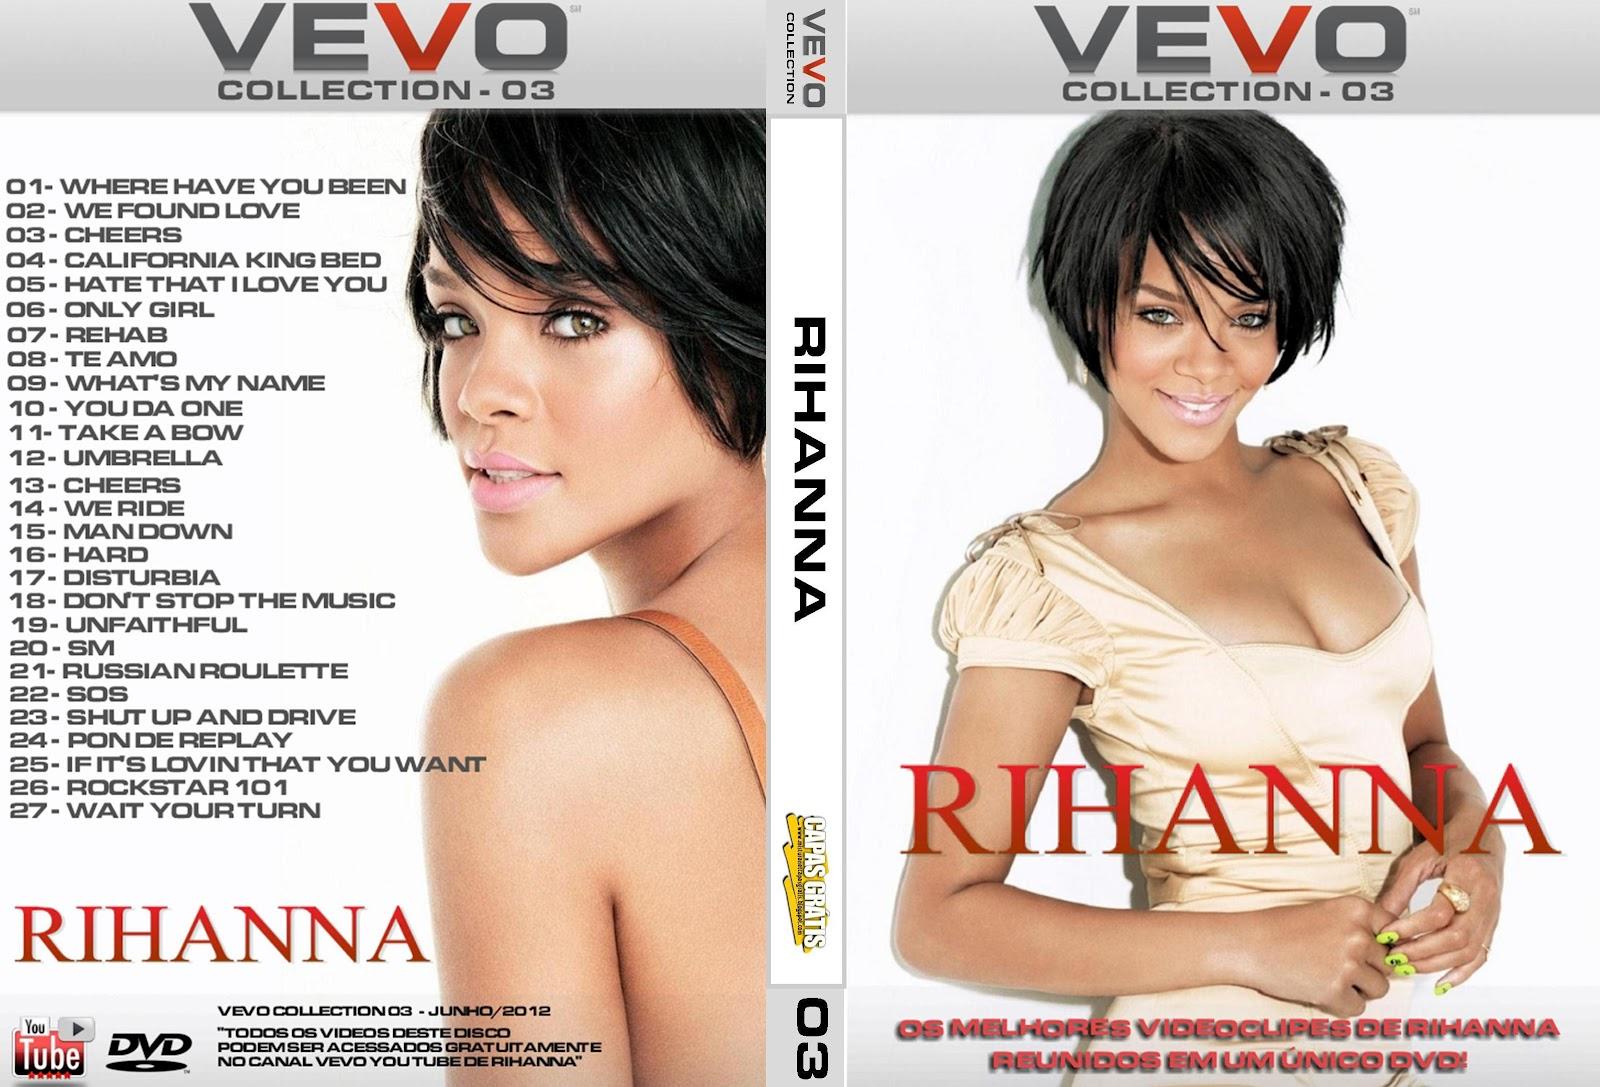 http://2.bp.blogspot.com/-w7O1WePVE98/T-fVT2ayVcI/AAAAAAAAAsk/FS5_UhymBJY/s1600/Vevo+-+Rihanna.jpg